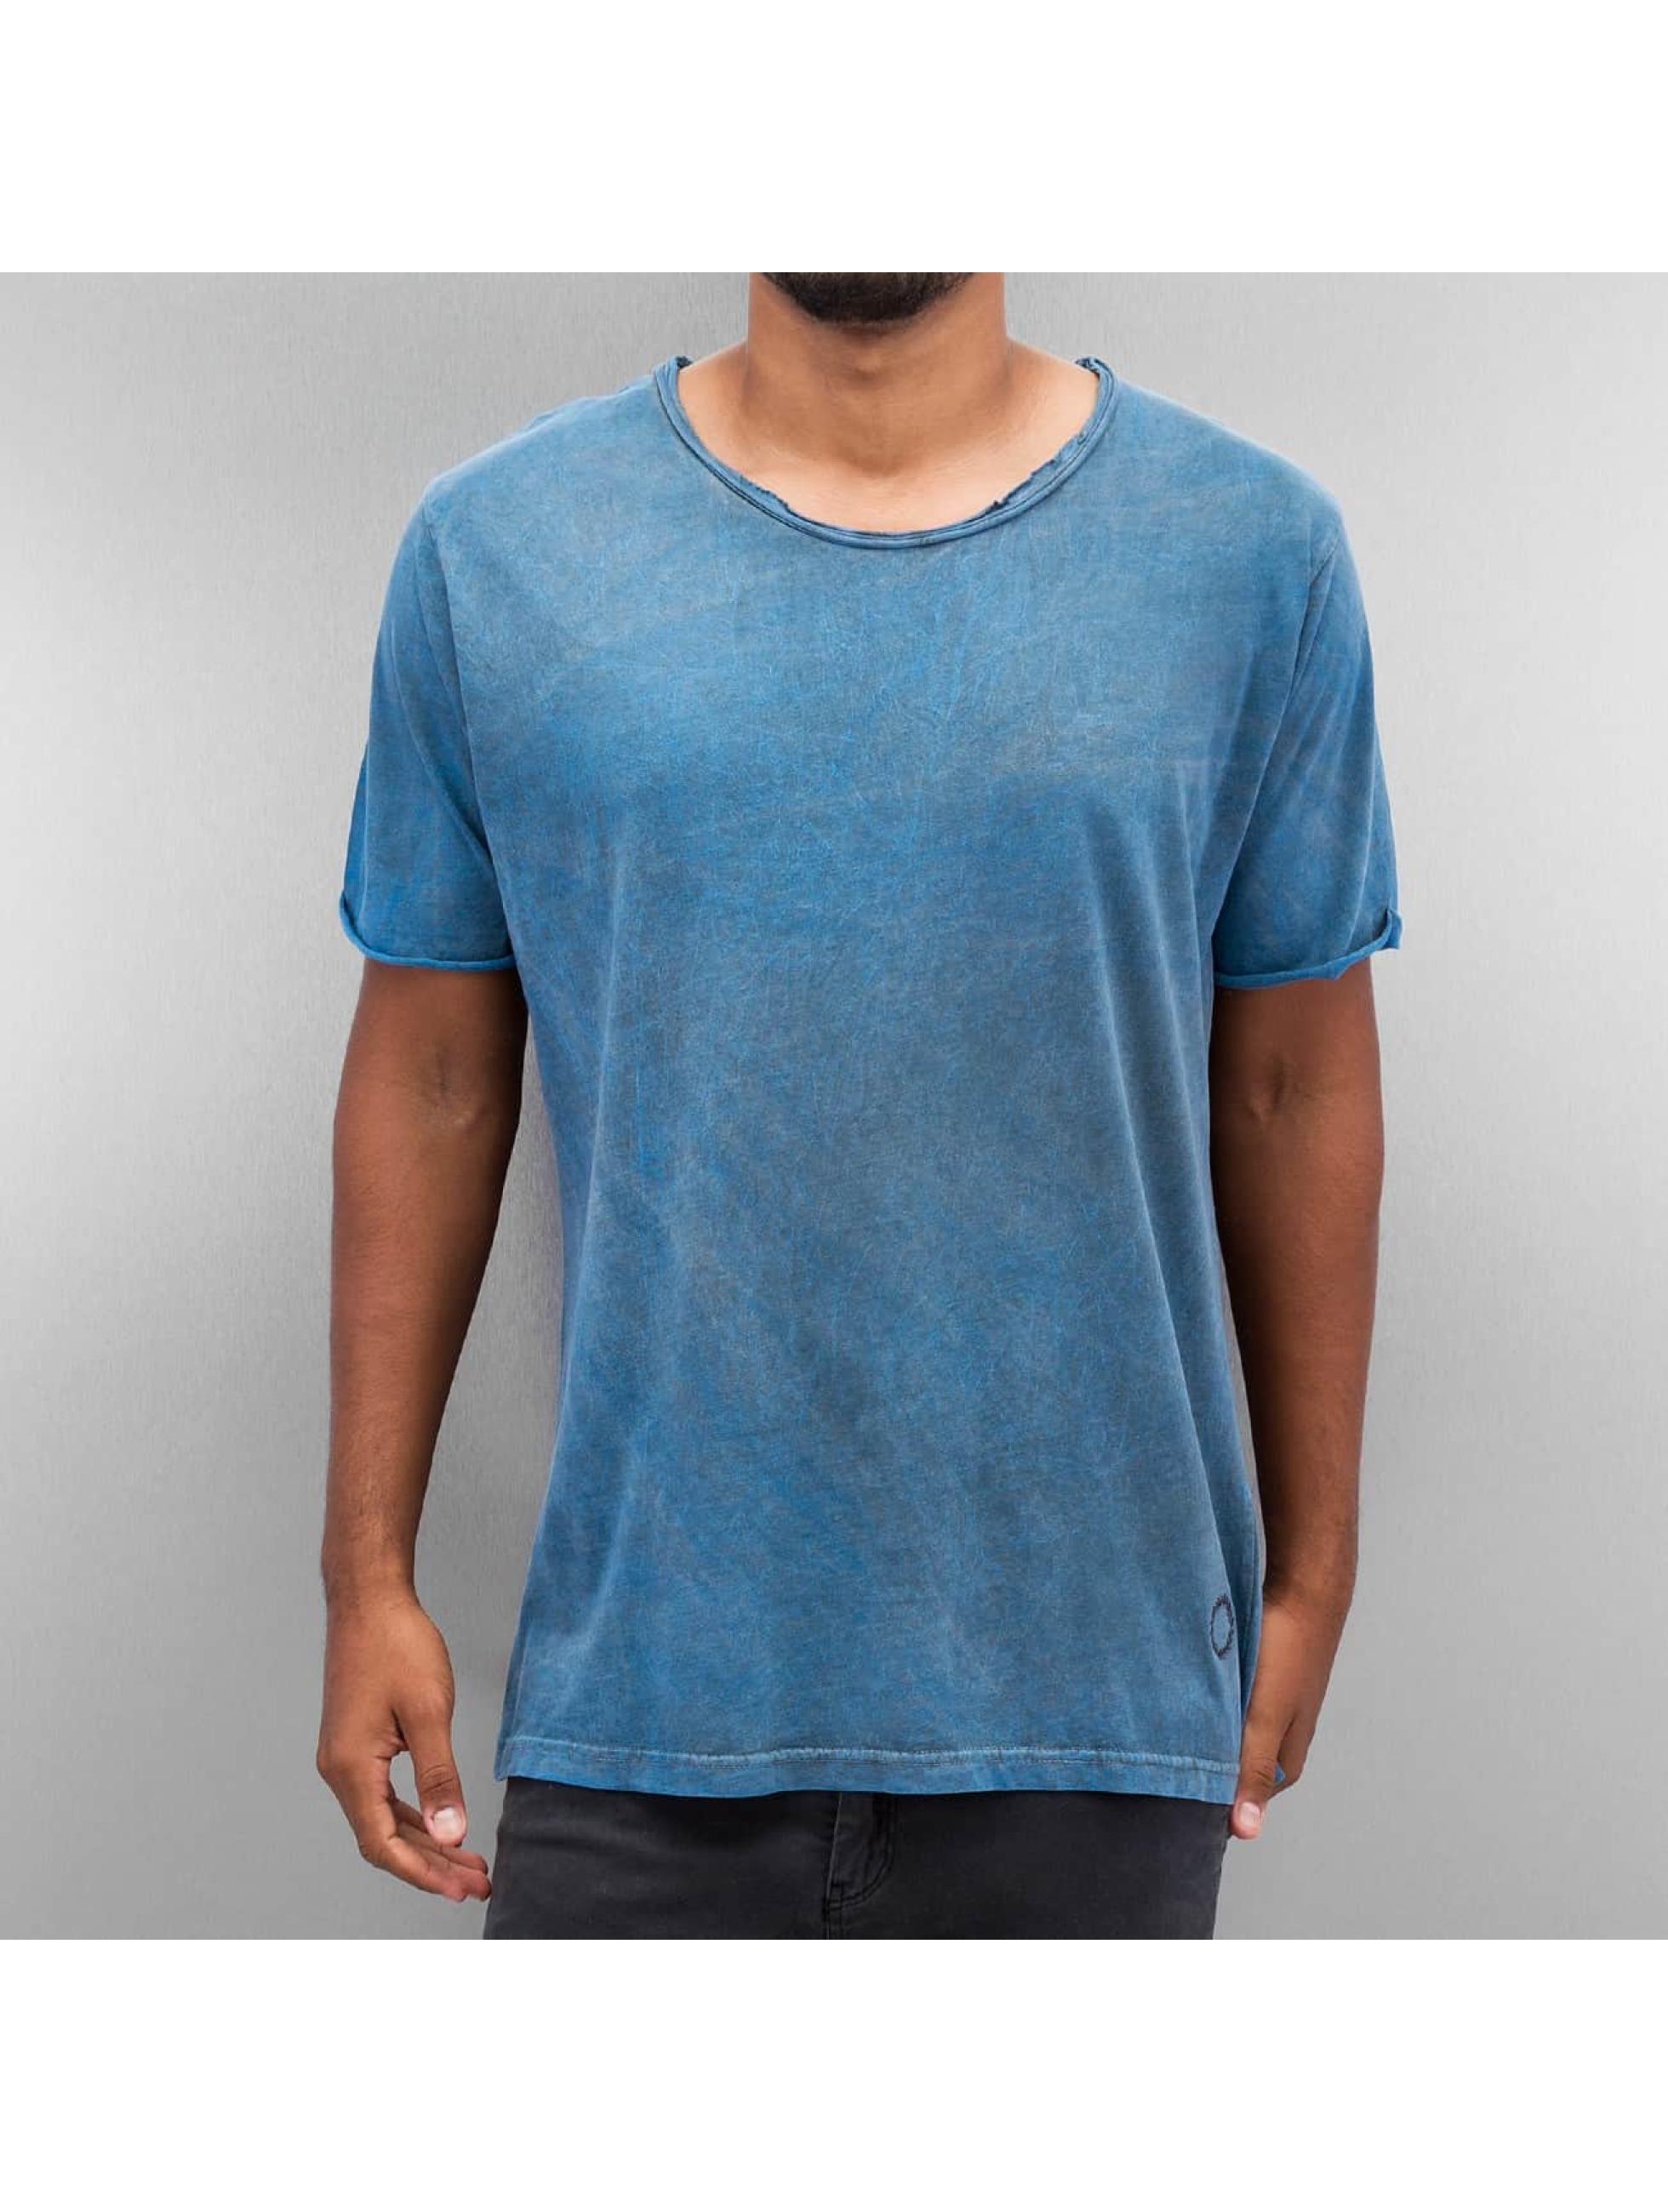 Yezz Tričká Marble modrá